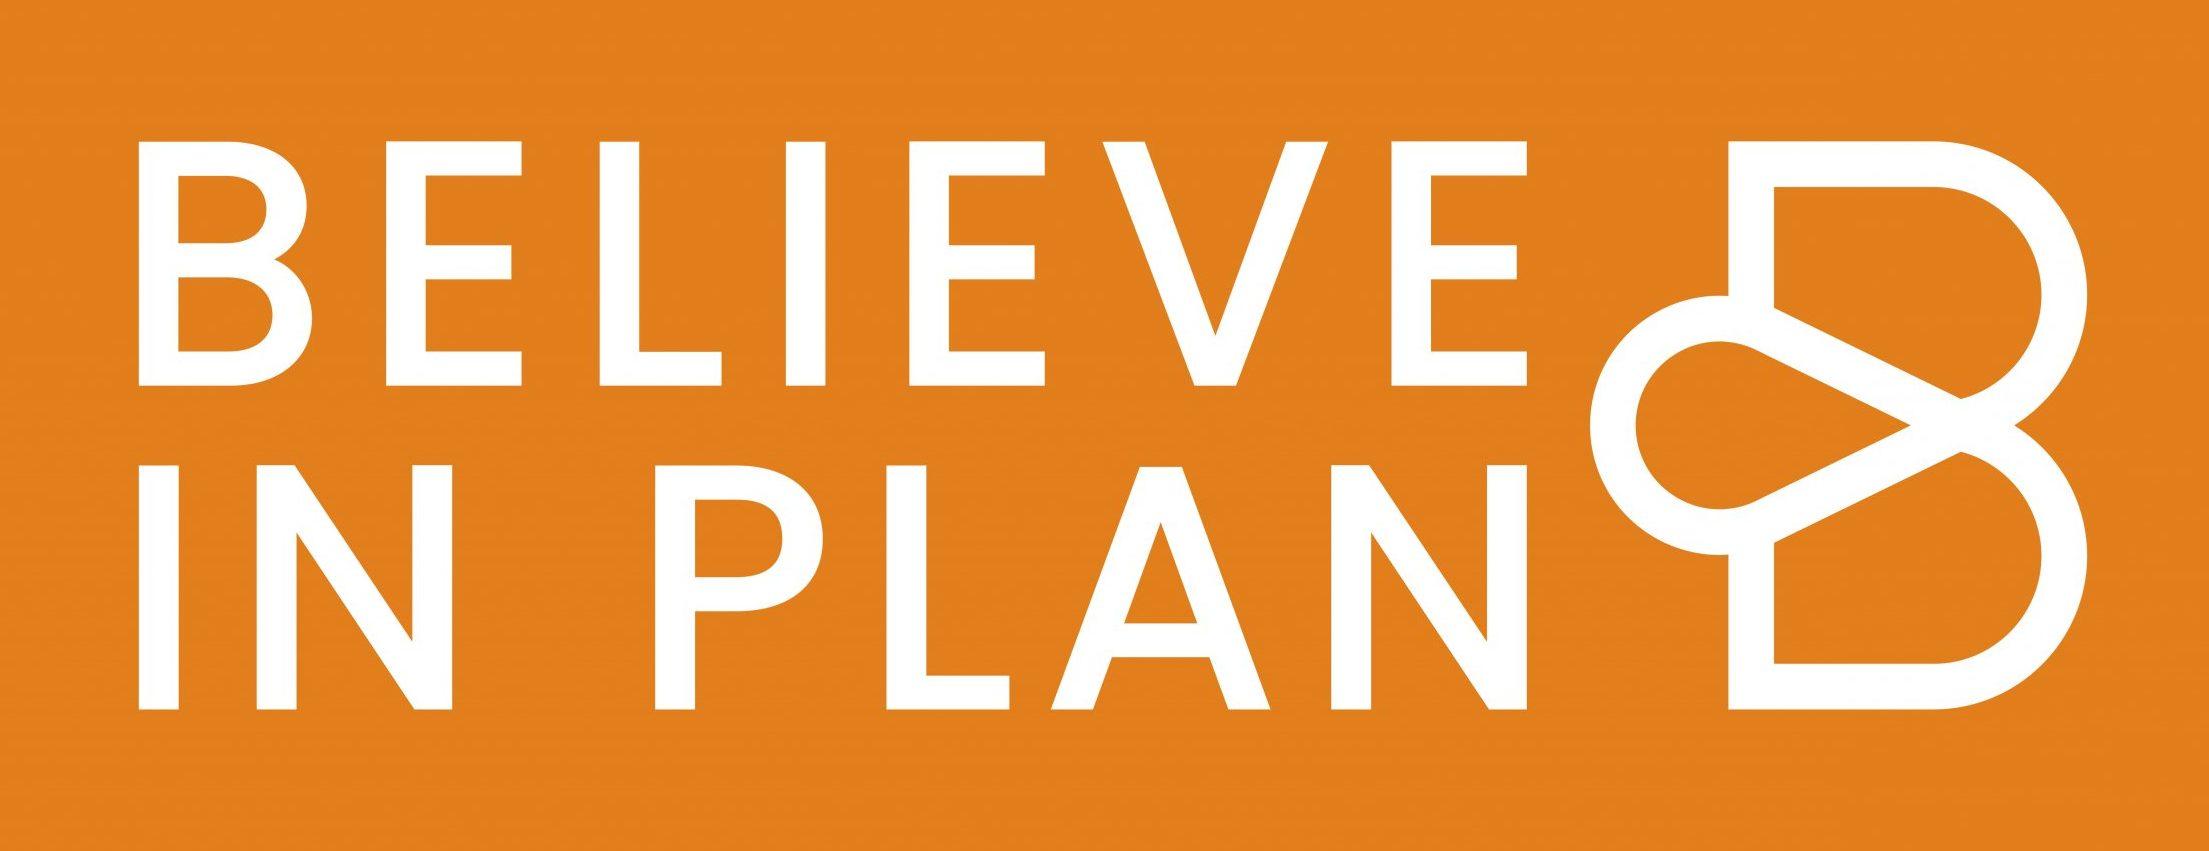 https://believeinplanb.com/wp-content/uploads/2020/08/cropped-logo-1-2.jpg-2.jpg